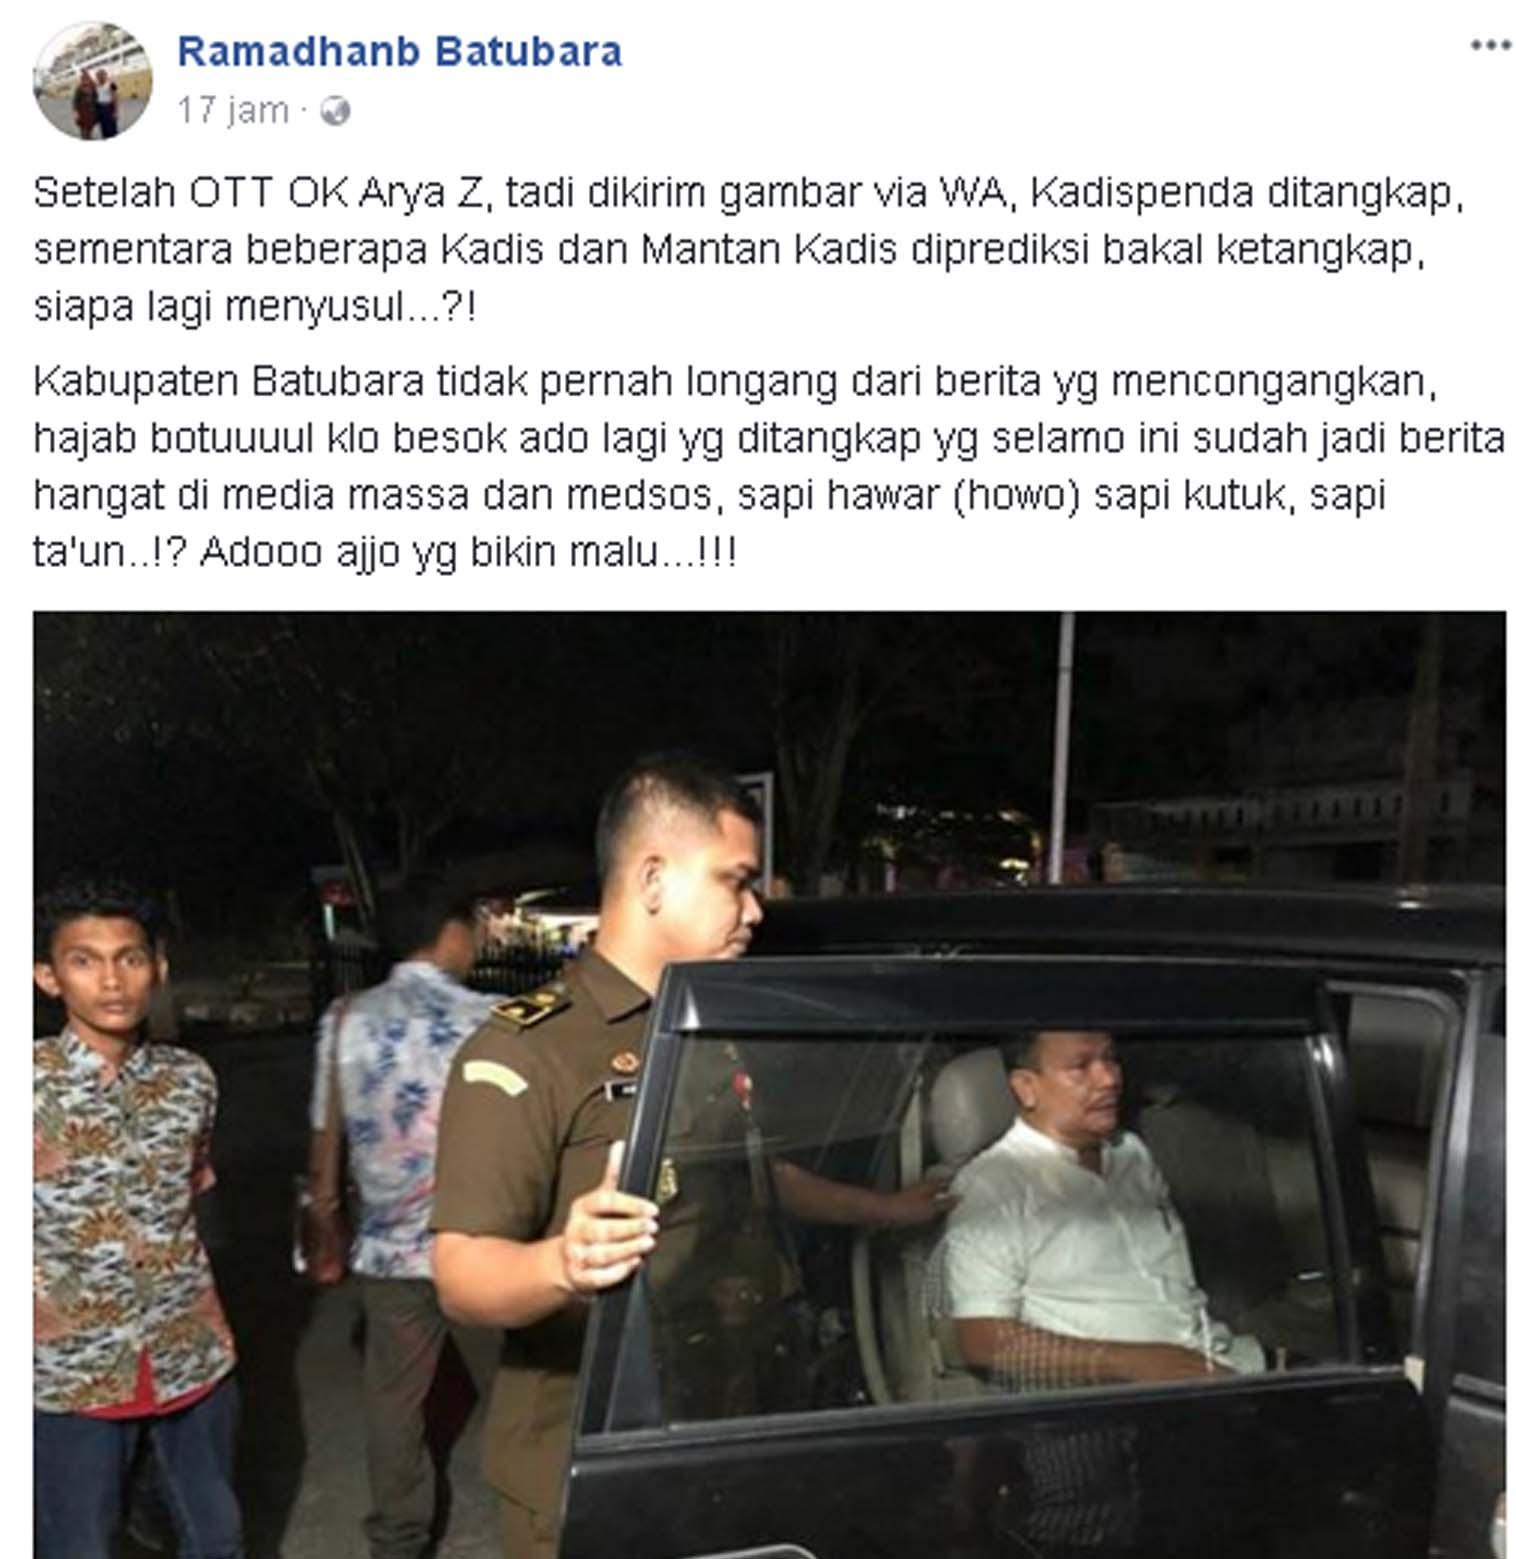 Kadis Penda Batubara Zulkifli (baju kemeja putih warna putih) saat dimasukkan ke dalam mobil oleh pihak kejaksaan.